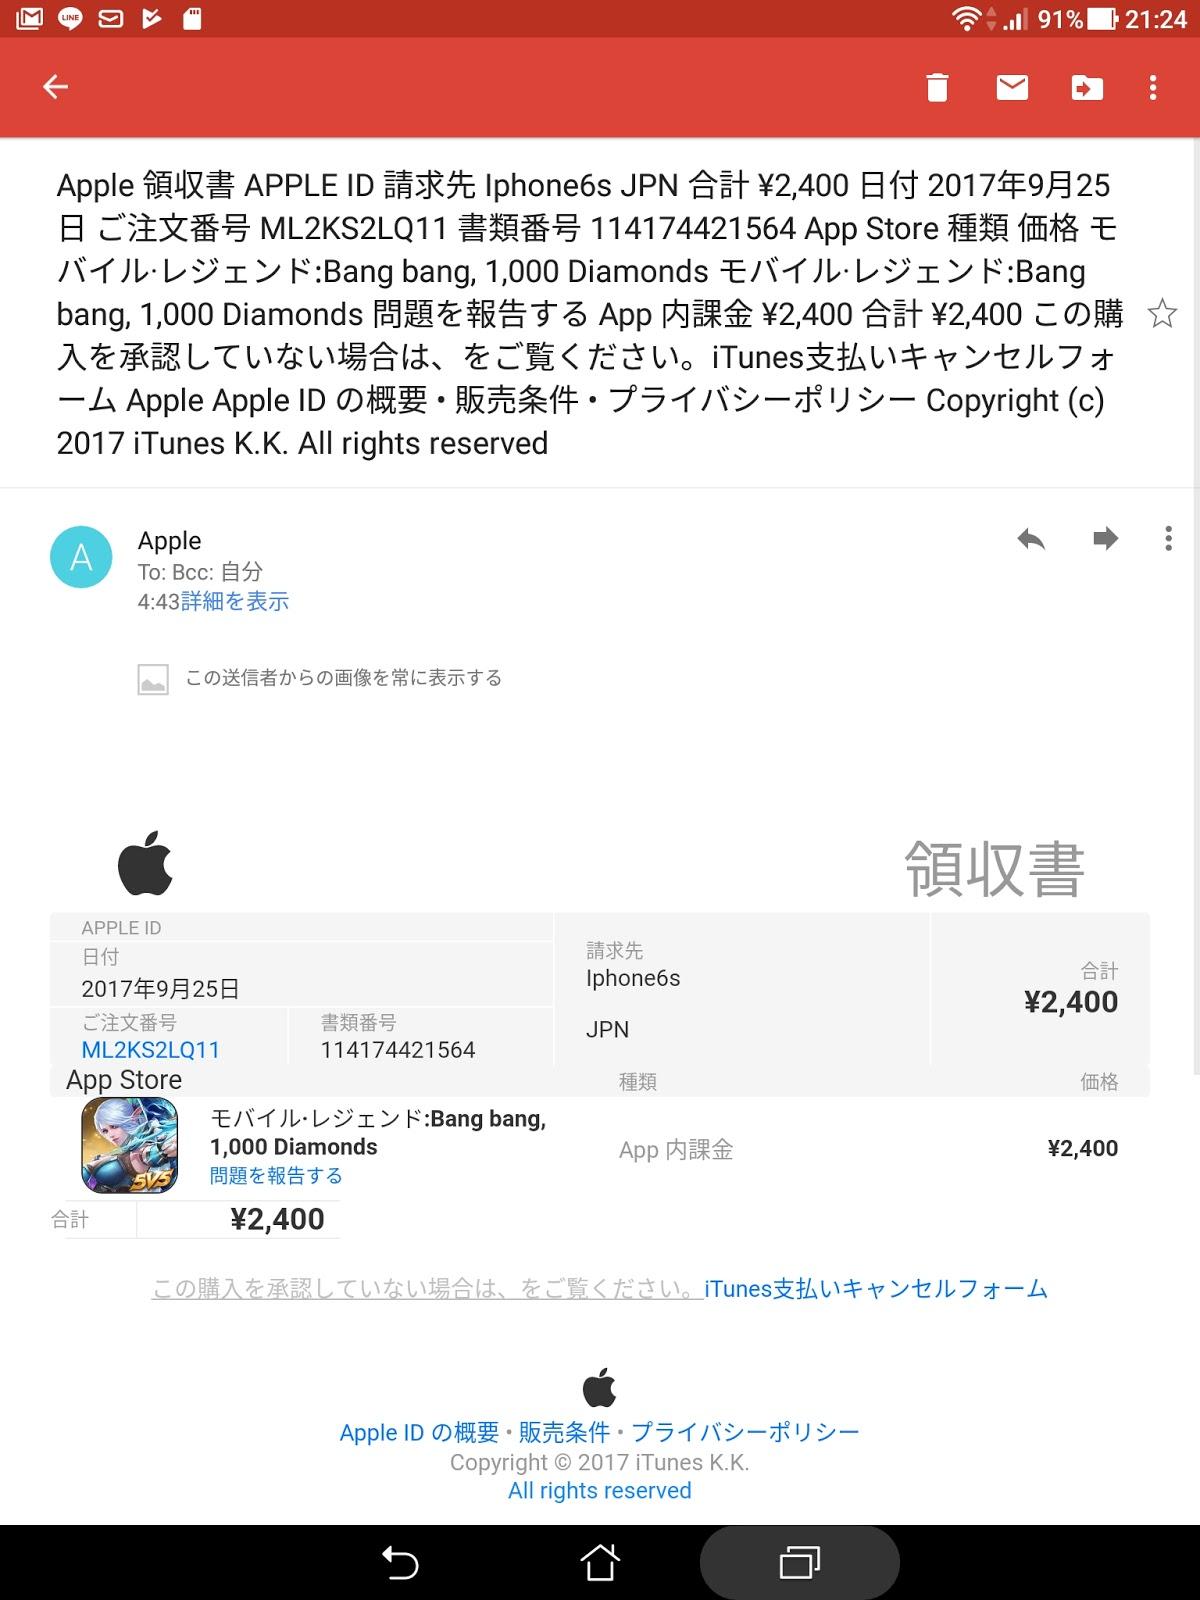 Apple 領収 書 IPhone - Apple IDの購入履歴の確認